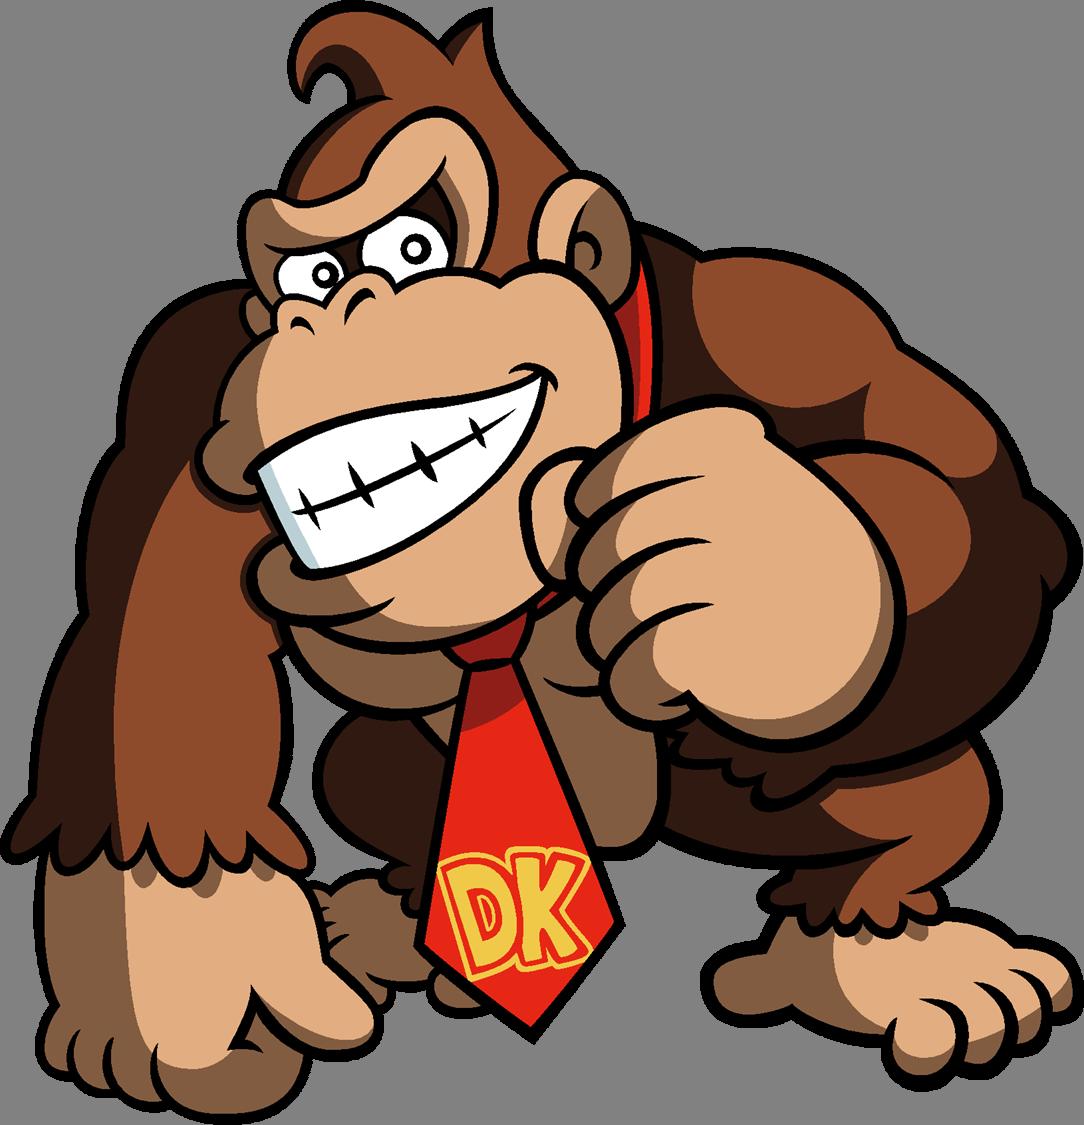 Donkey Kong PNG Image File.